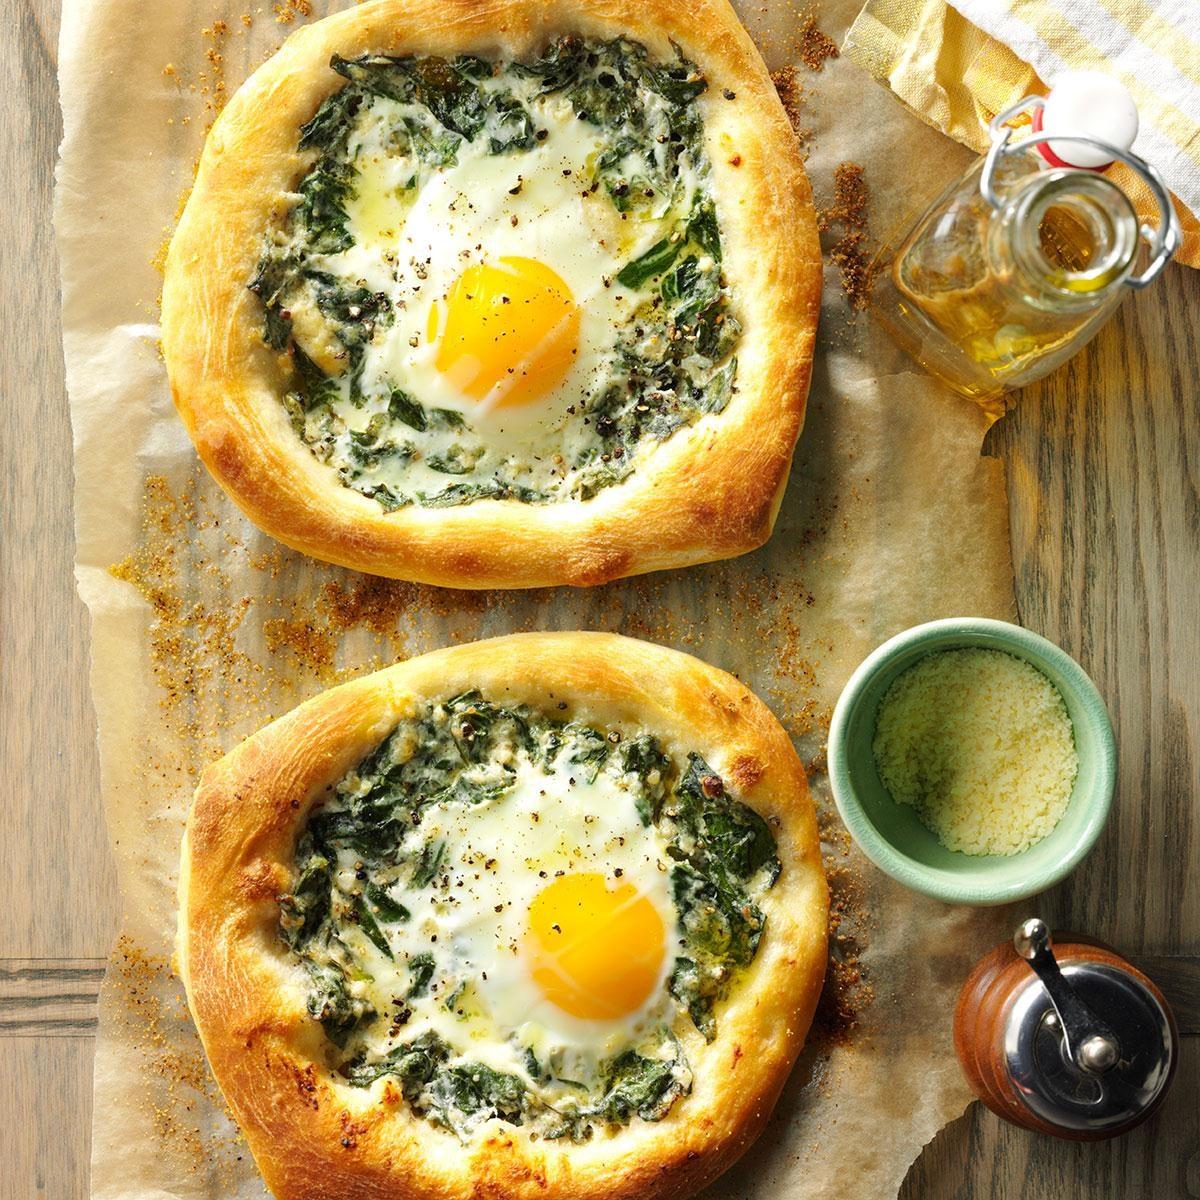 Spinach-Egg Breakfast Pizzas Recipe